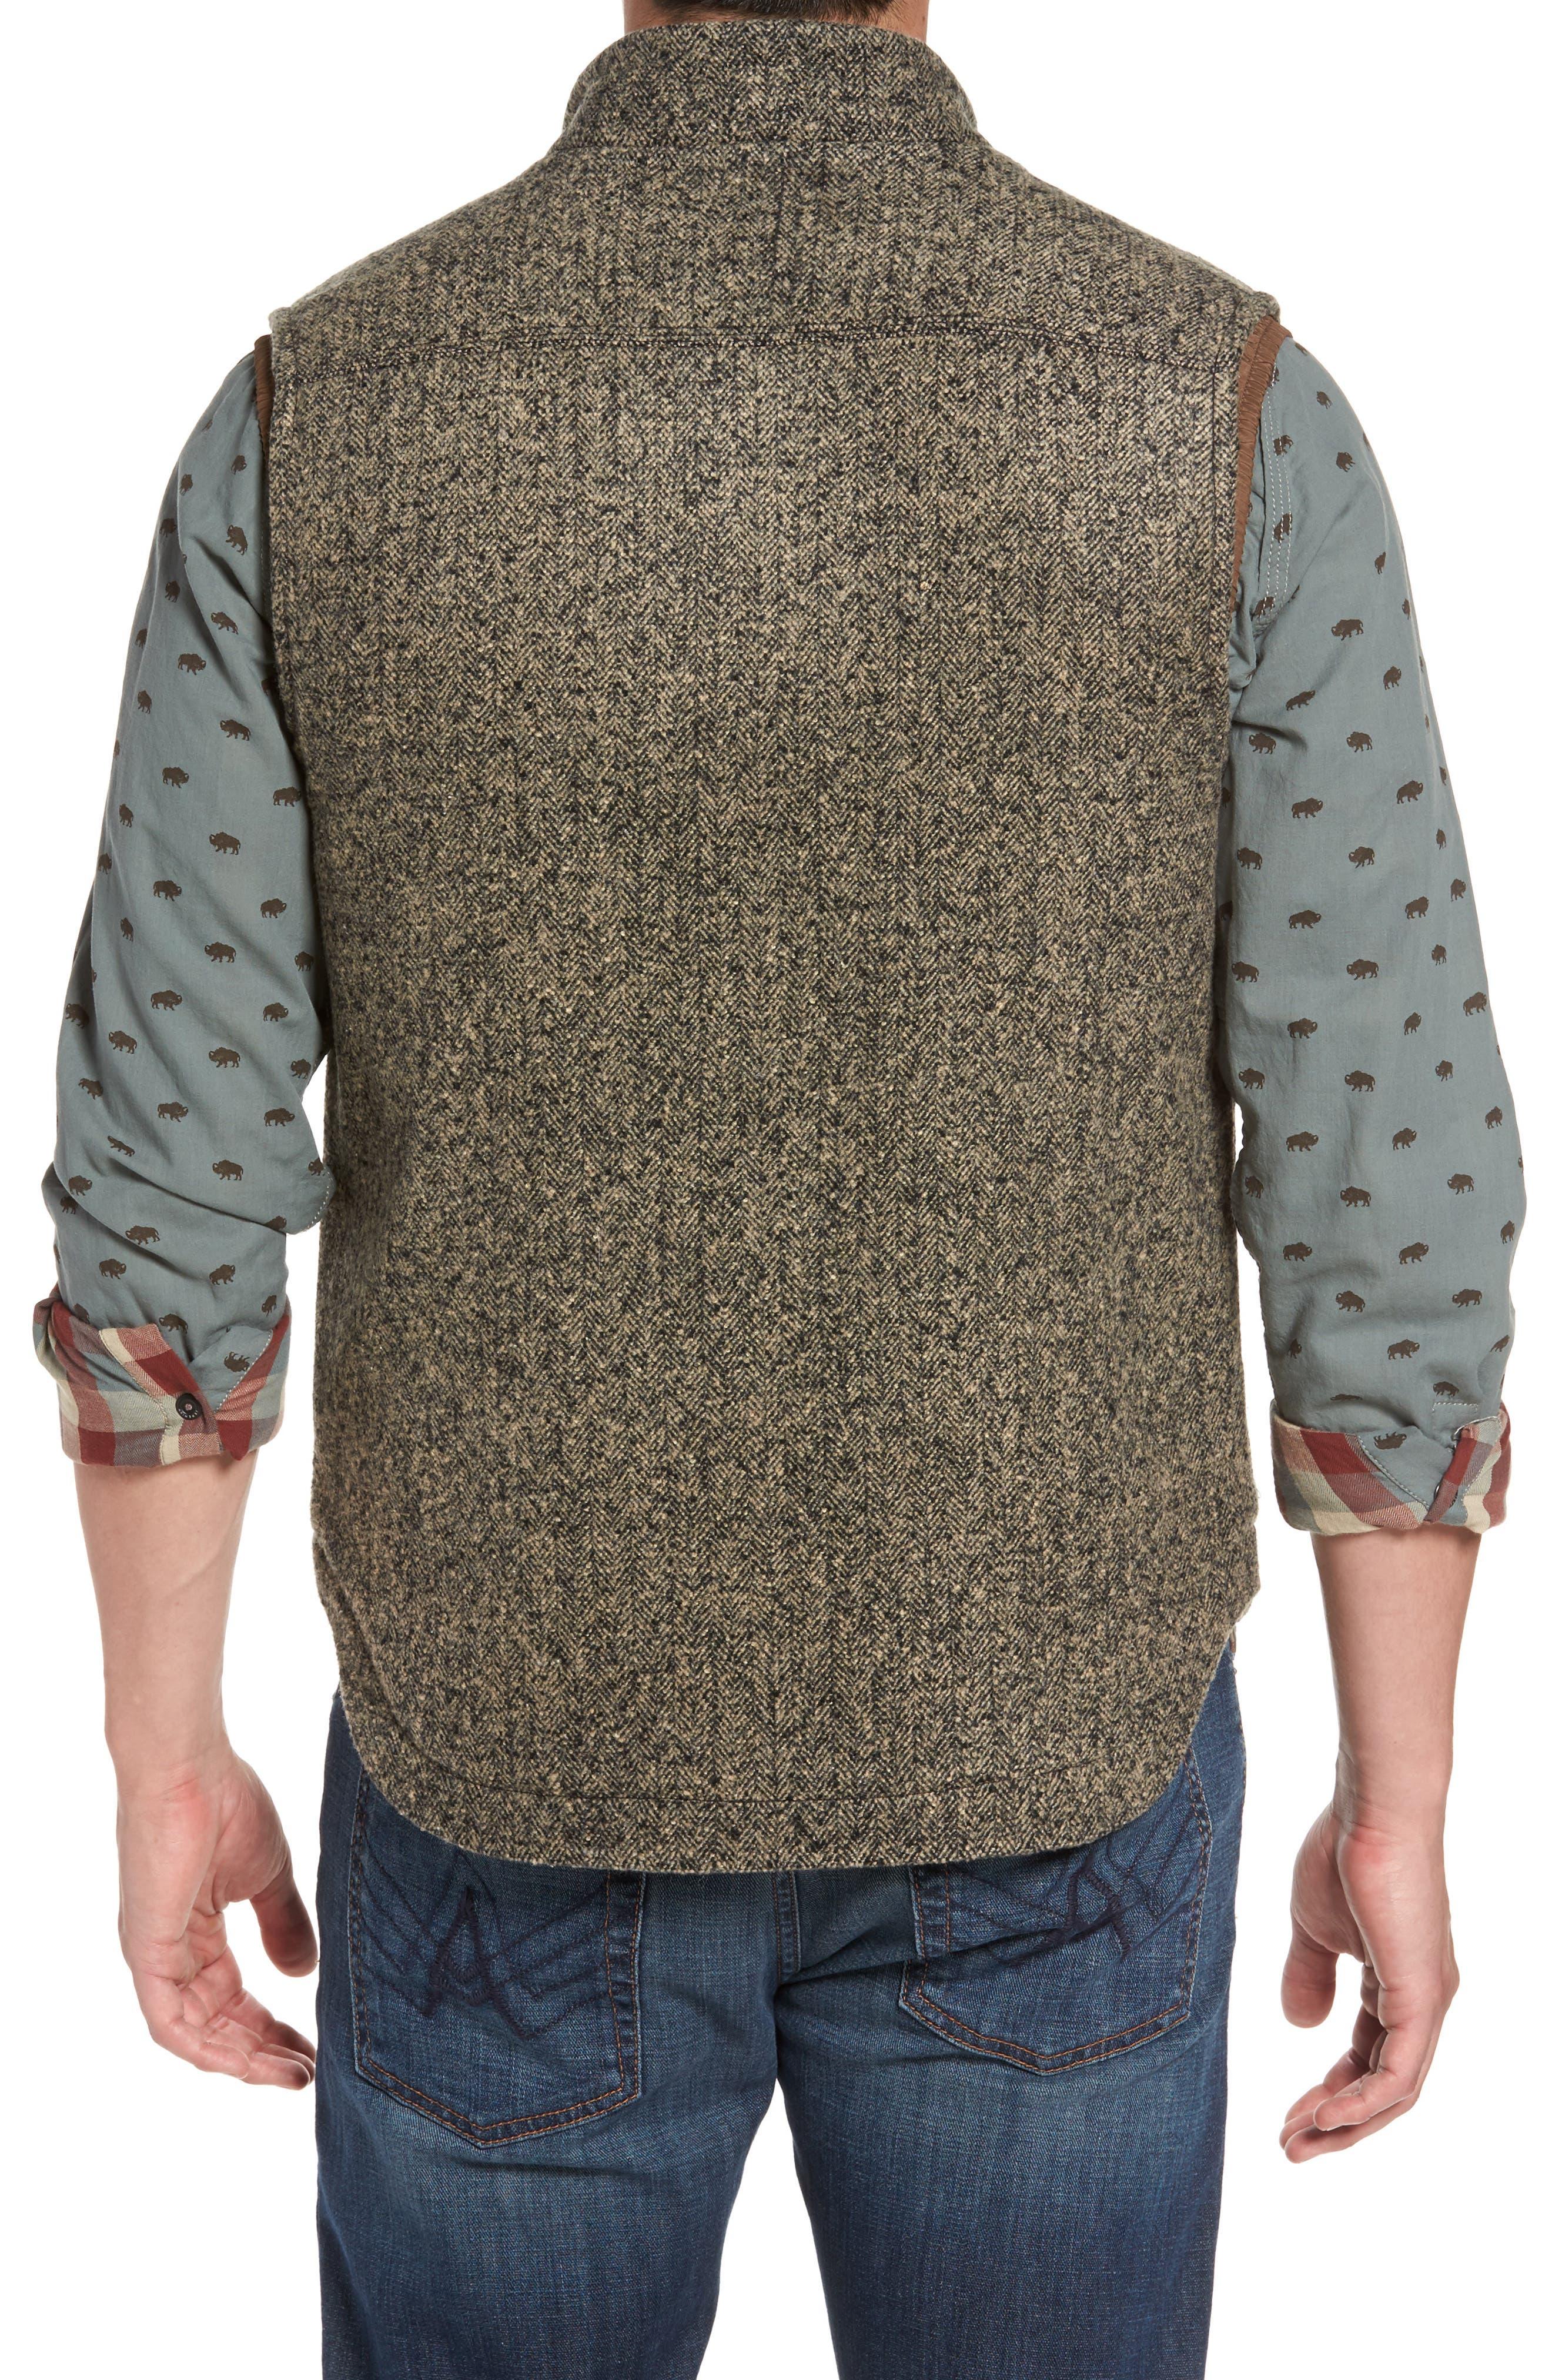 Sanford Herringbone Vest,                             Alternate thumbnail 2, color,                             Mule Heather